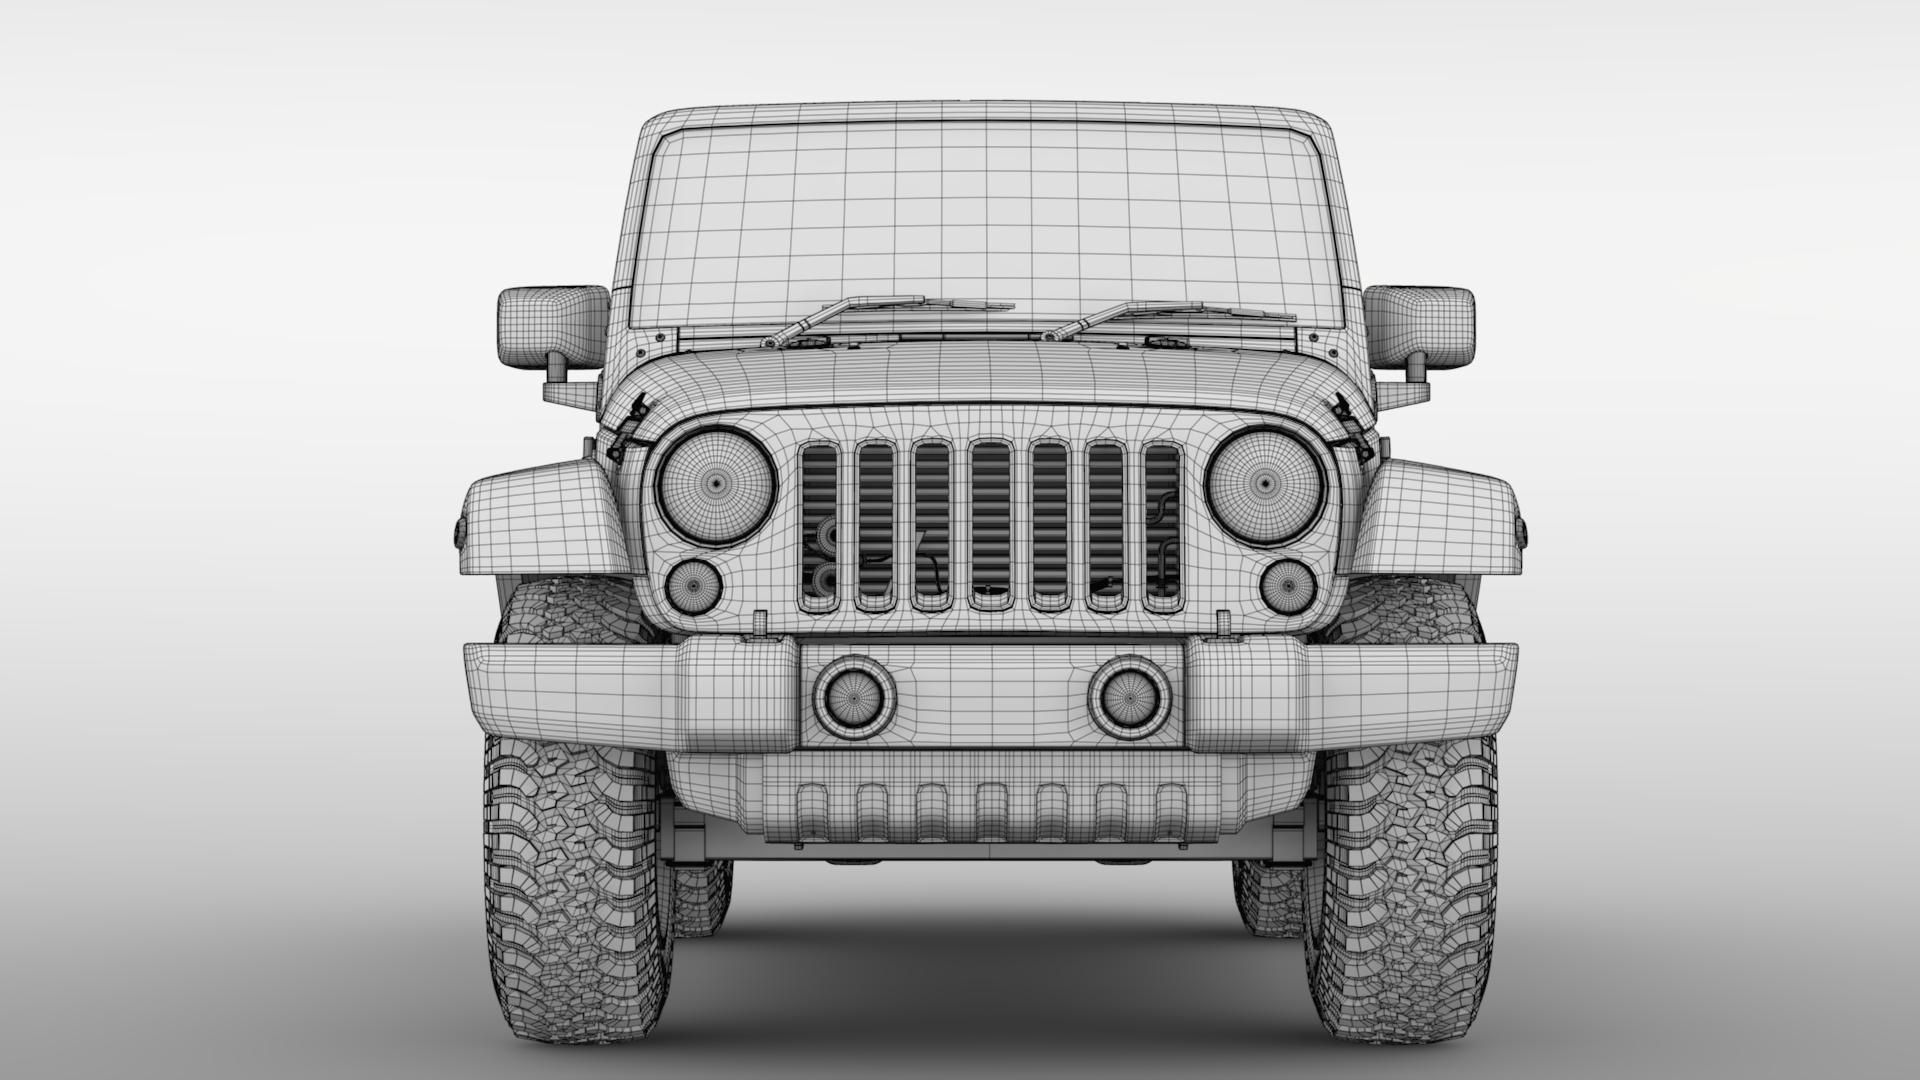 jeep wrangler willys wheeler jk 2017 3d model max fbx c4d lwo ma mb hrc xsi obj 276810